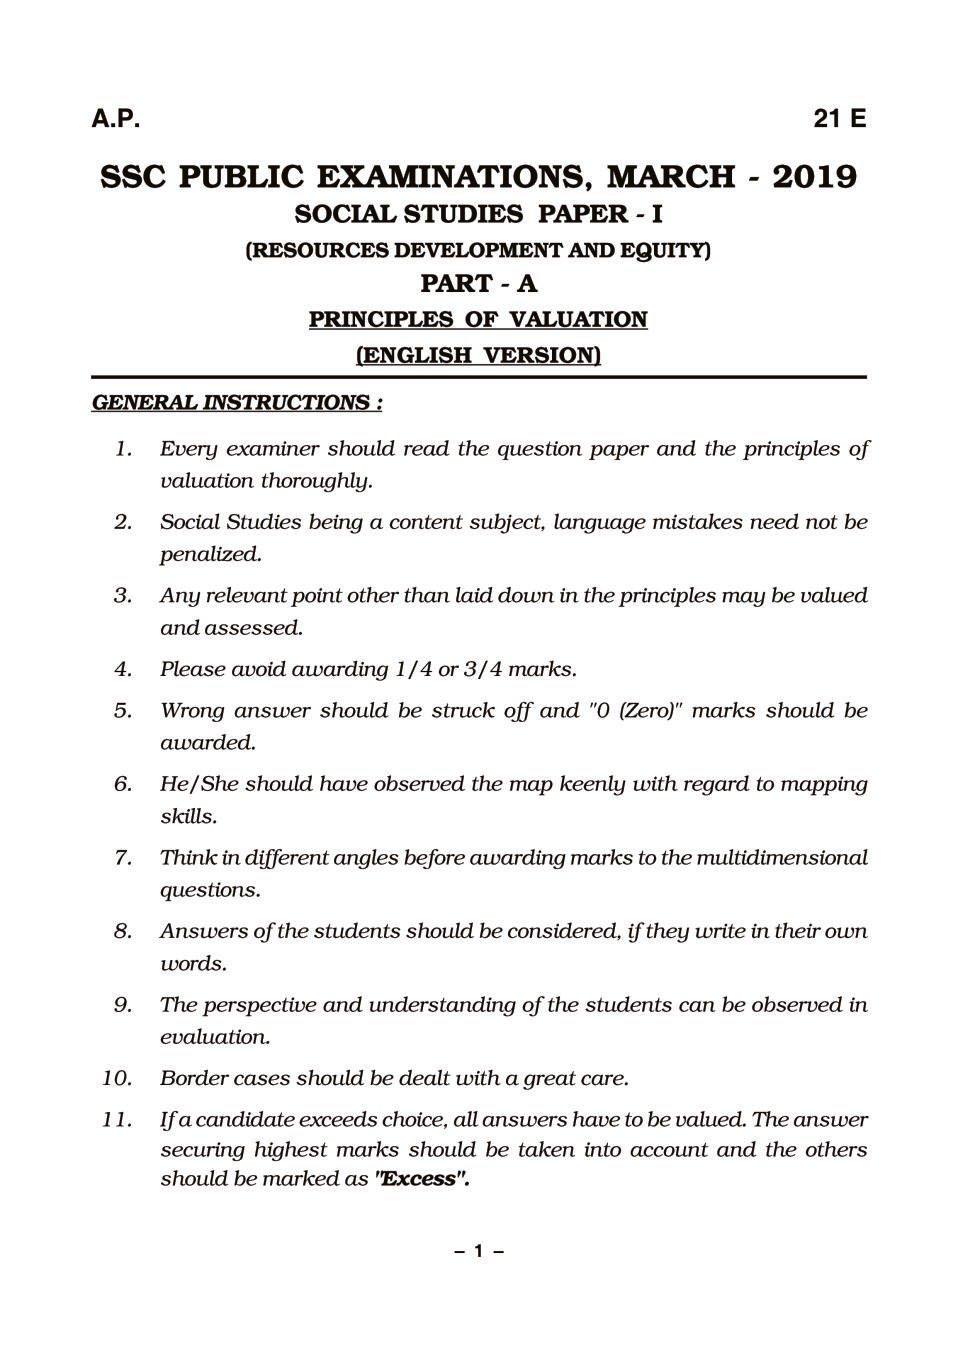 AP 10th Class Marking Scheme 2019 Social Studies - Paper 1 (English Medium) - Page 1